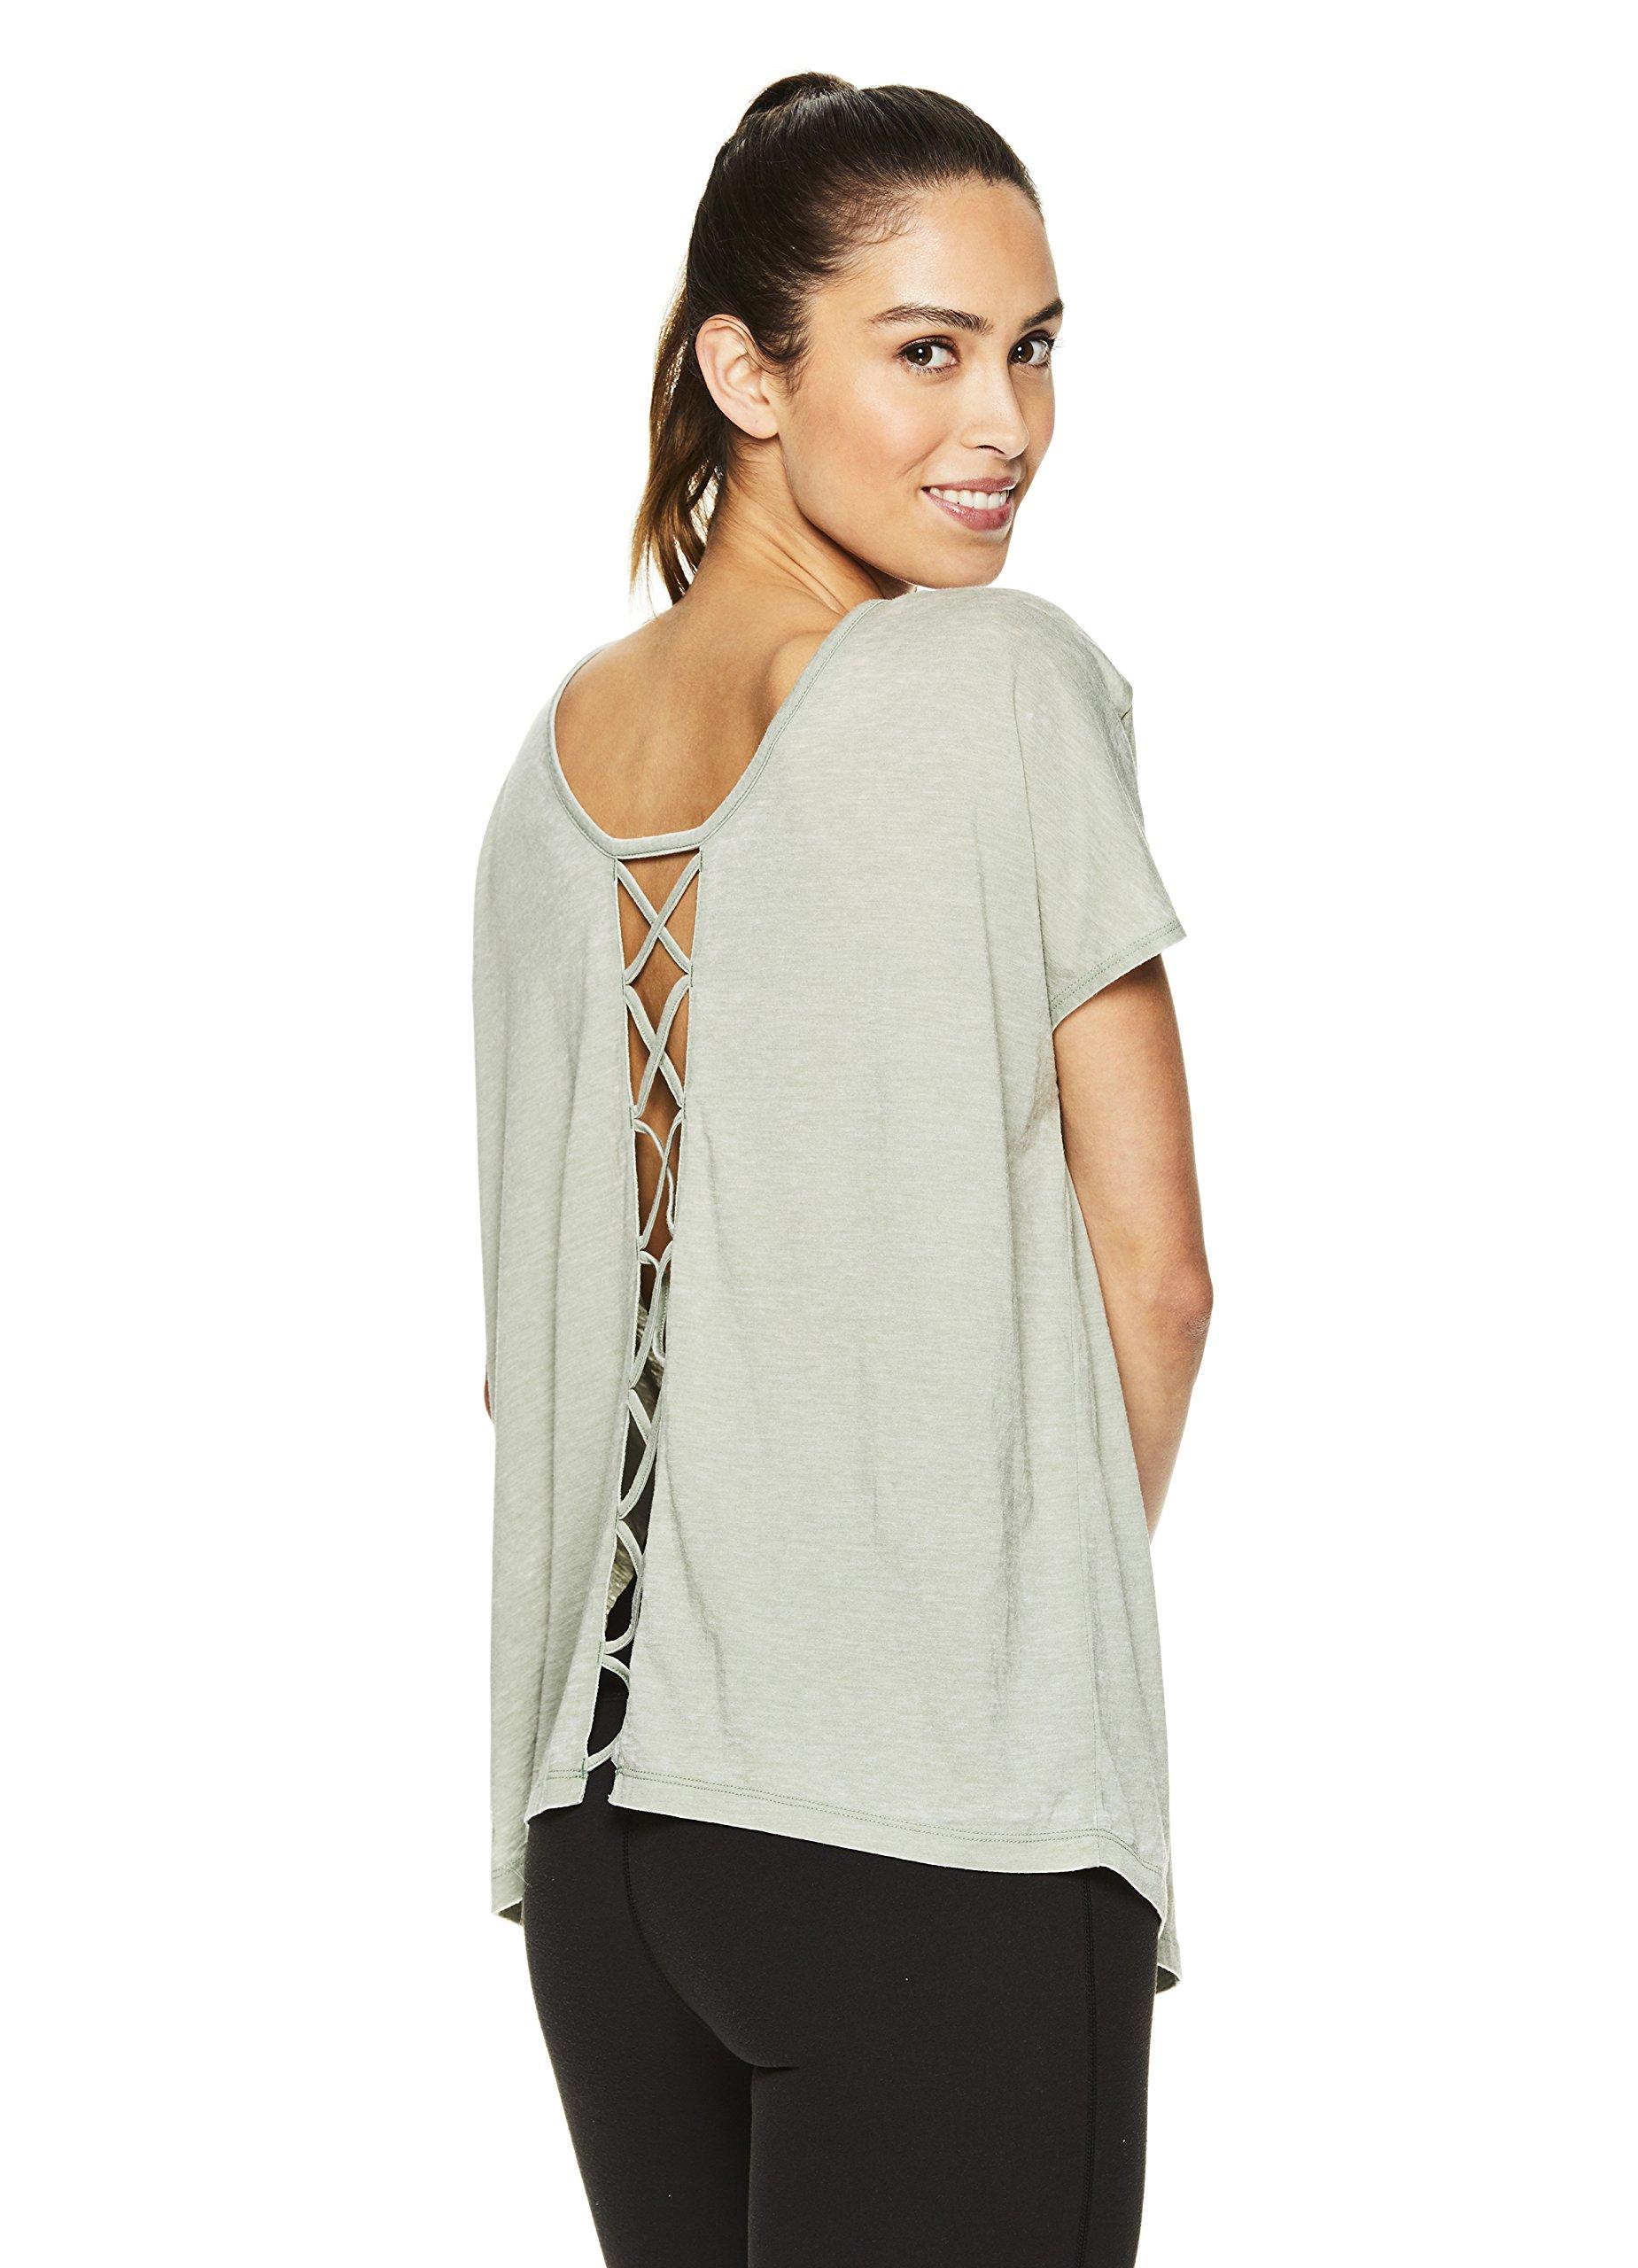 Gaiam Women's Short Sleeve Open Back Yoga T Shirt - Relaxed Fit Workout & Training Top - Dufflebag, X-Large